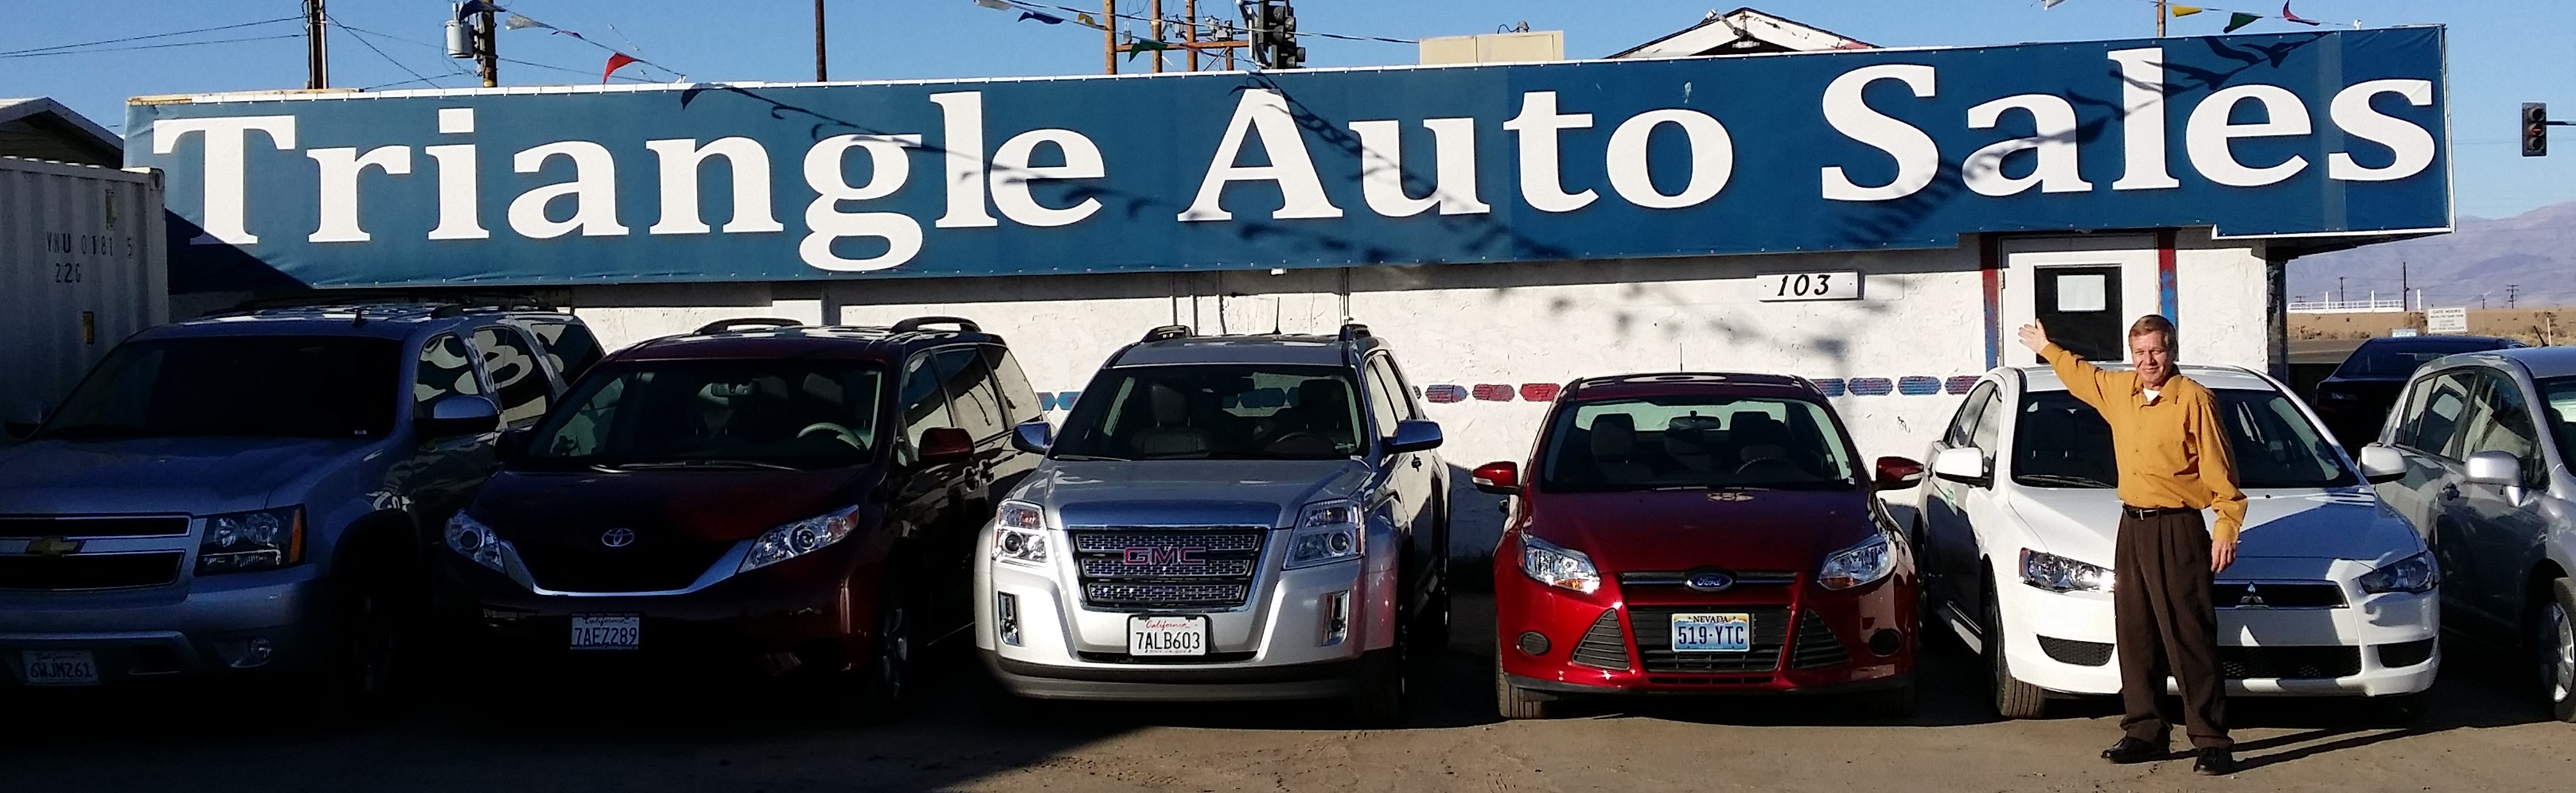 Triangle Auto Sales, Ridgecrest CA